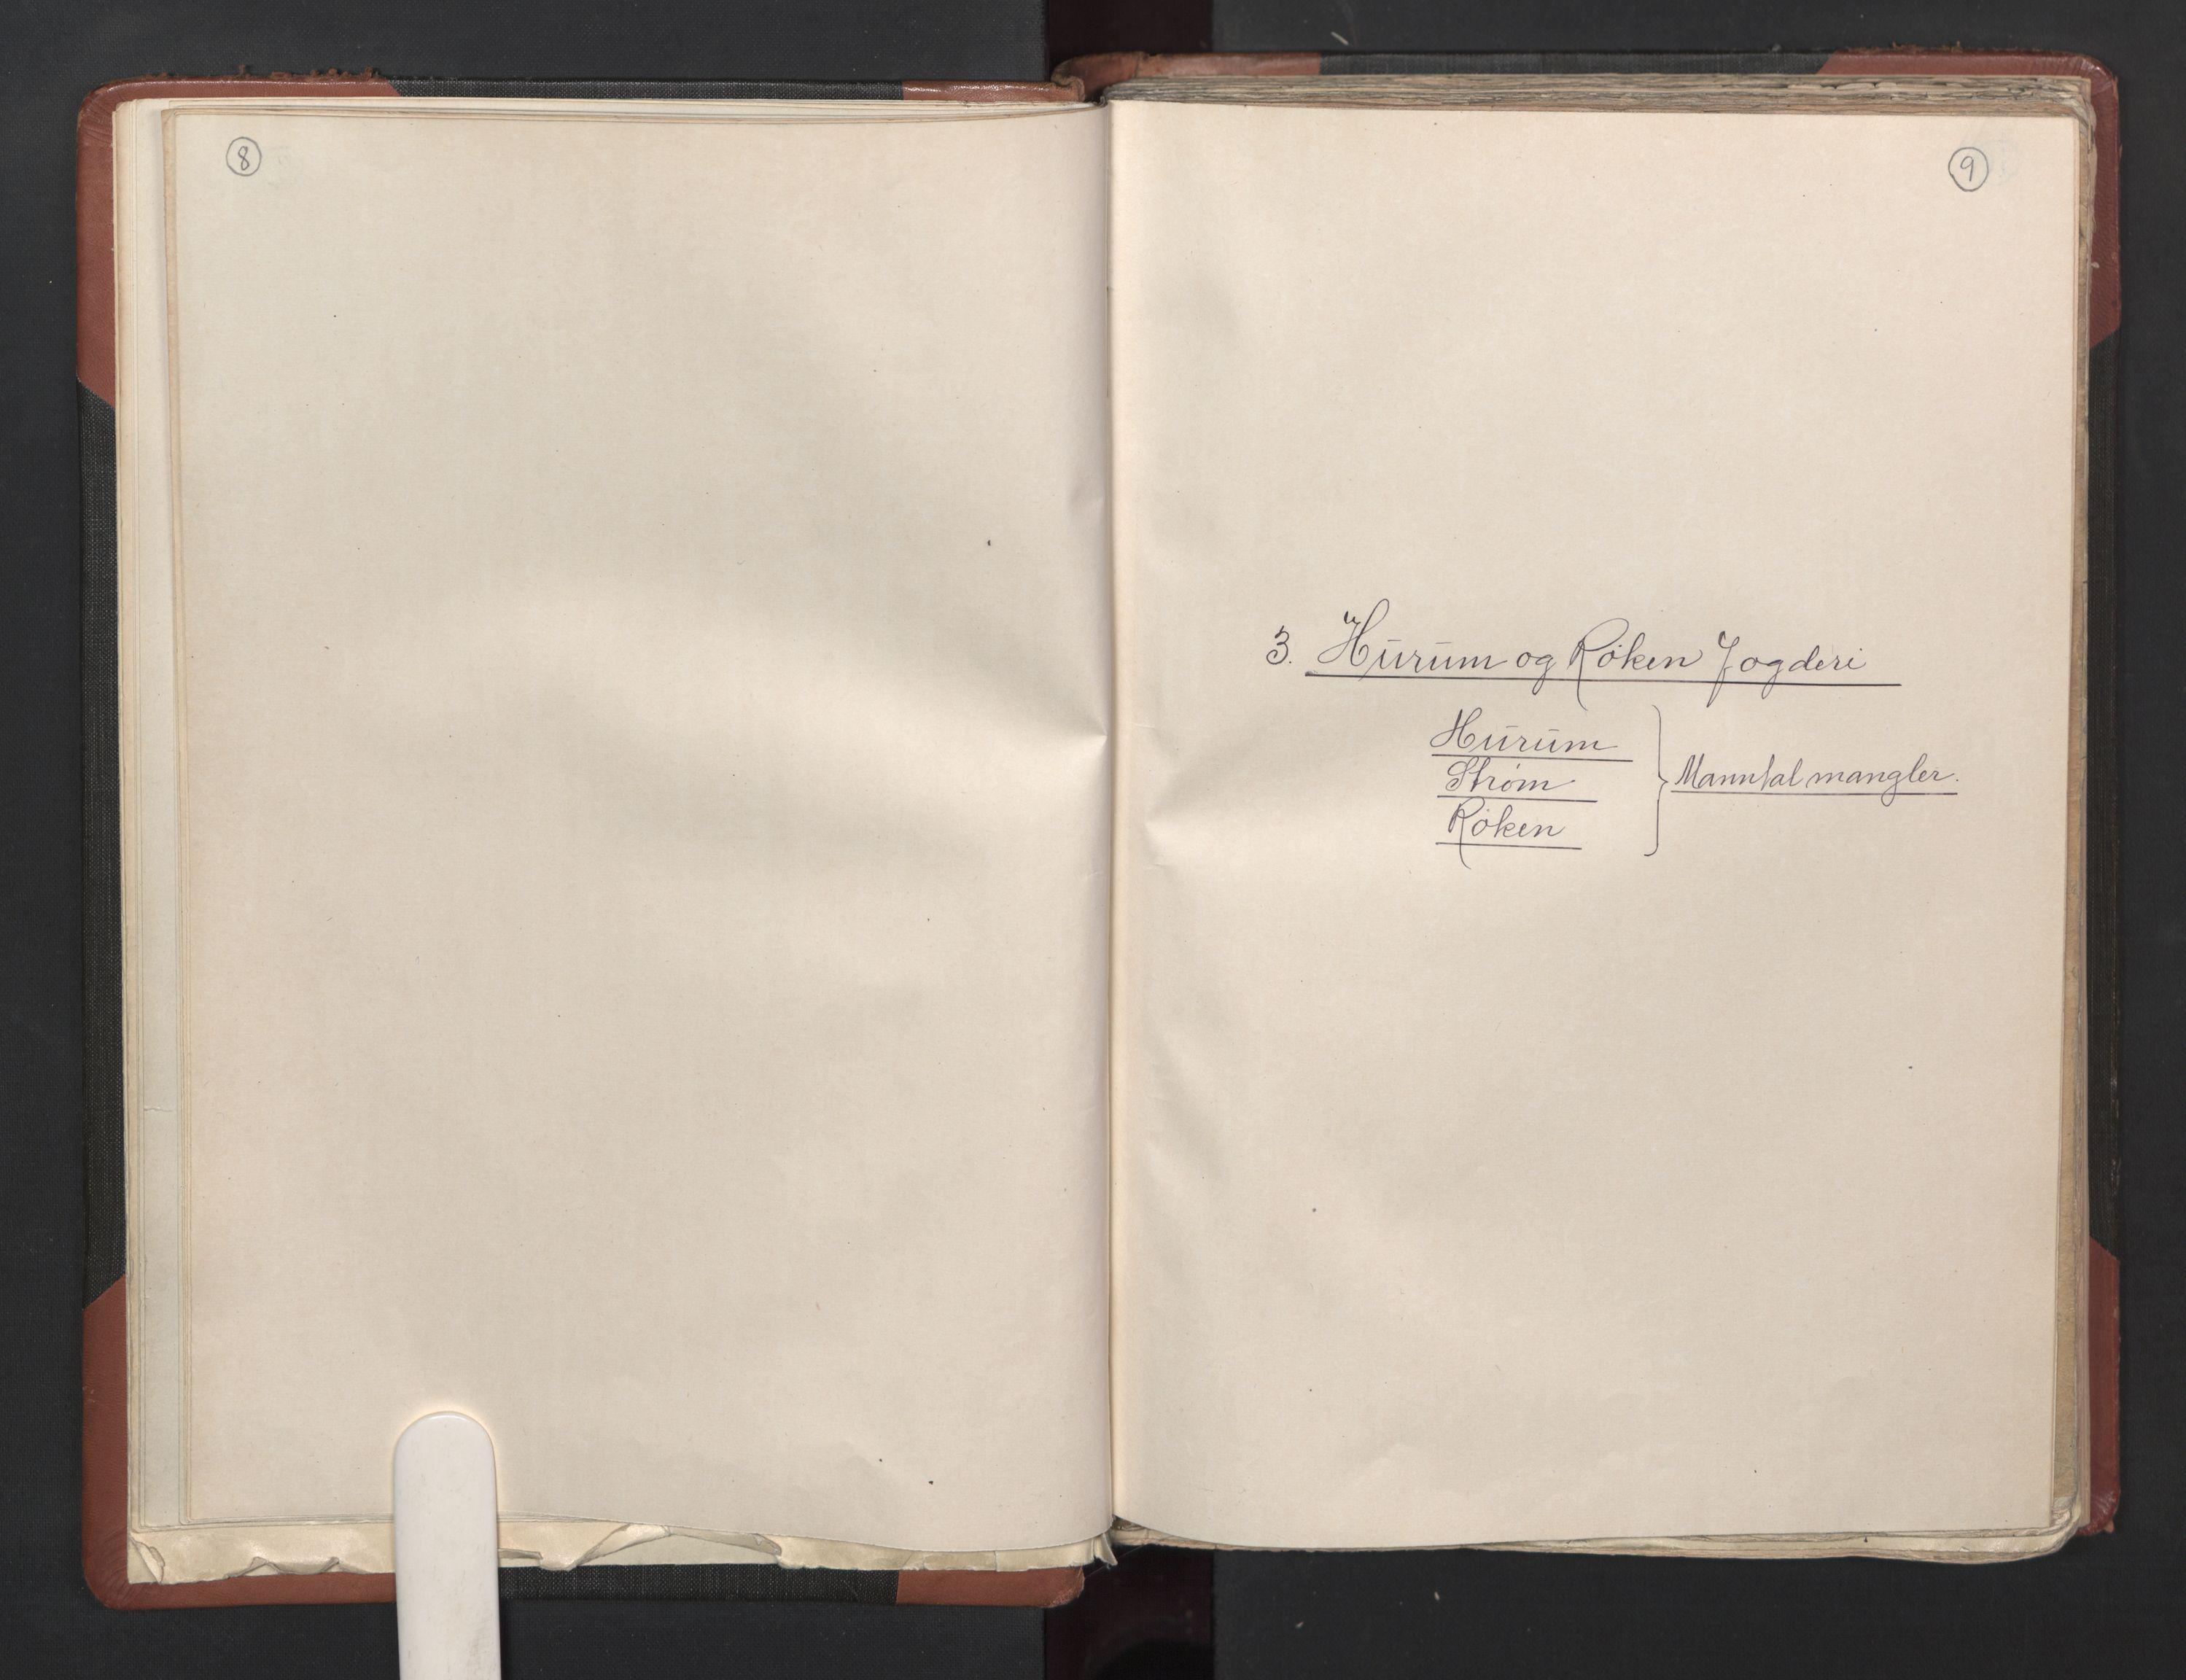 RA, Fogdenes og sorenskrivernes manntall 1664-1666, nr. 5: Fogderier (len og skipreider) i nåværende Buskerud fylke og Vestfold fylke, 1664, s. 8-9